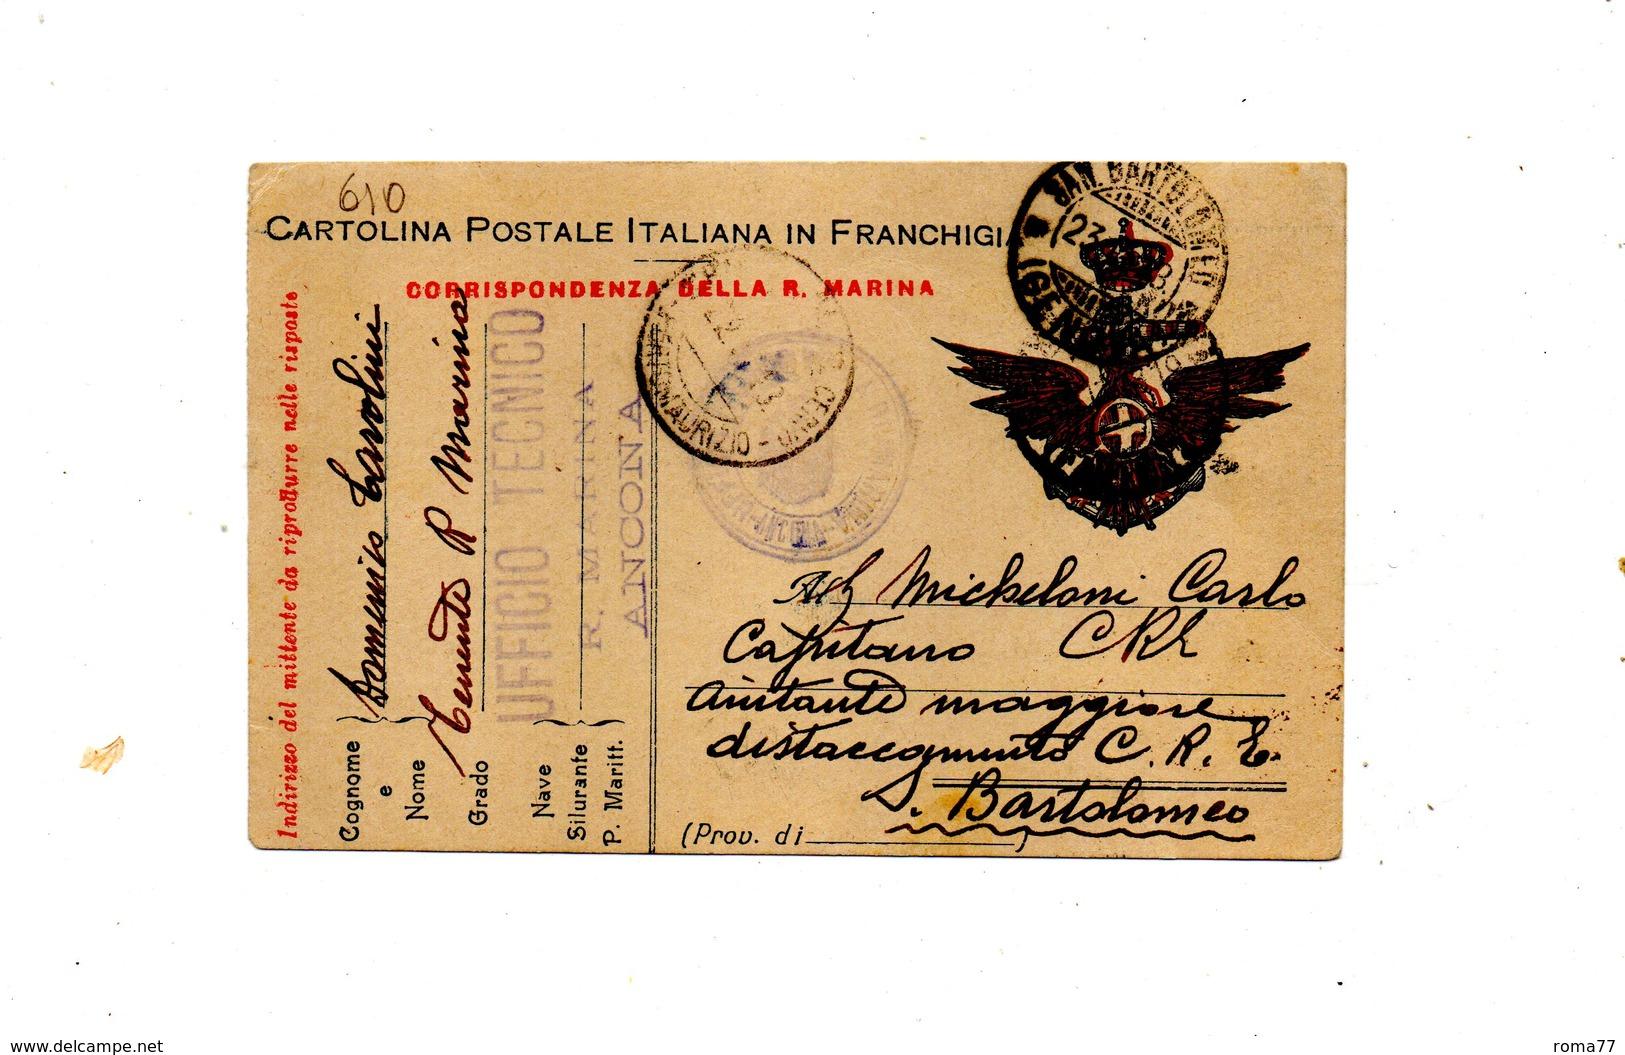 "LAB610- REGNO 1918 , Cartolina Postale Franchigia "" Corrispondenza R. Marina "". - 1900-44 Vittorio Emanuele III"